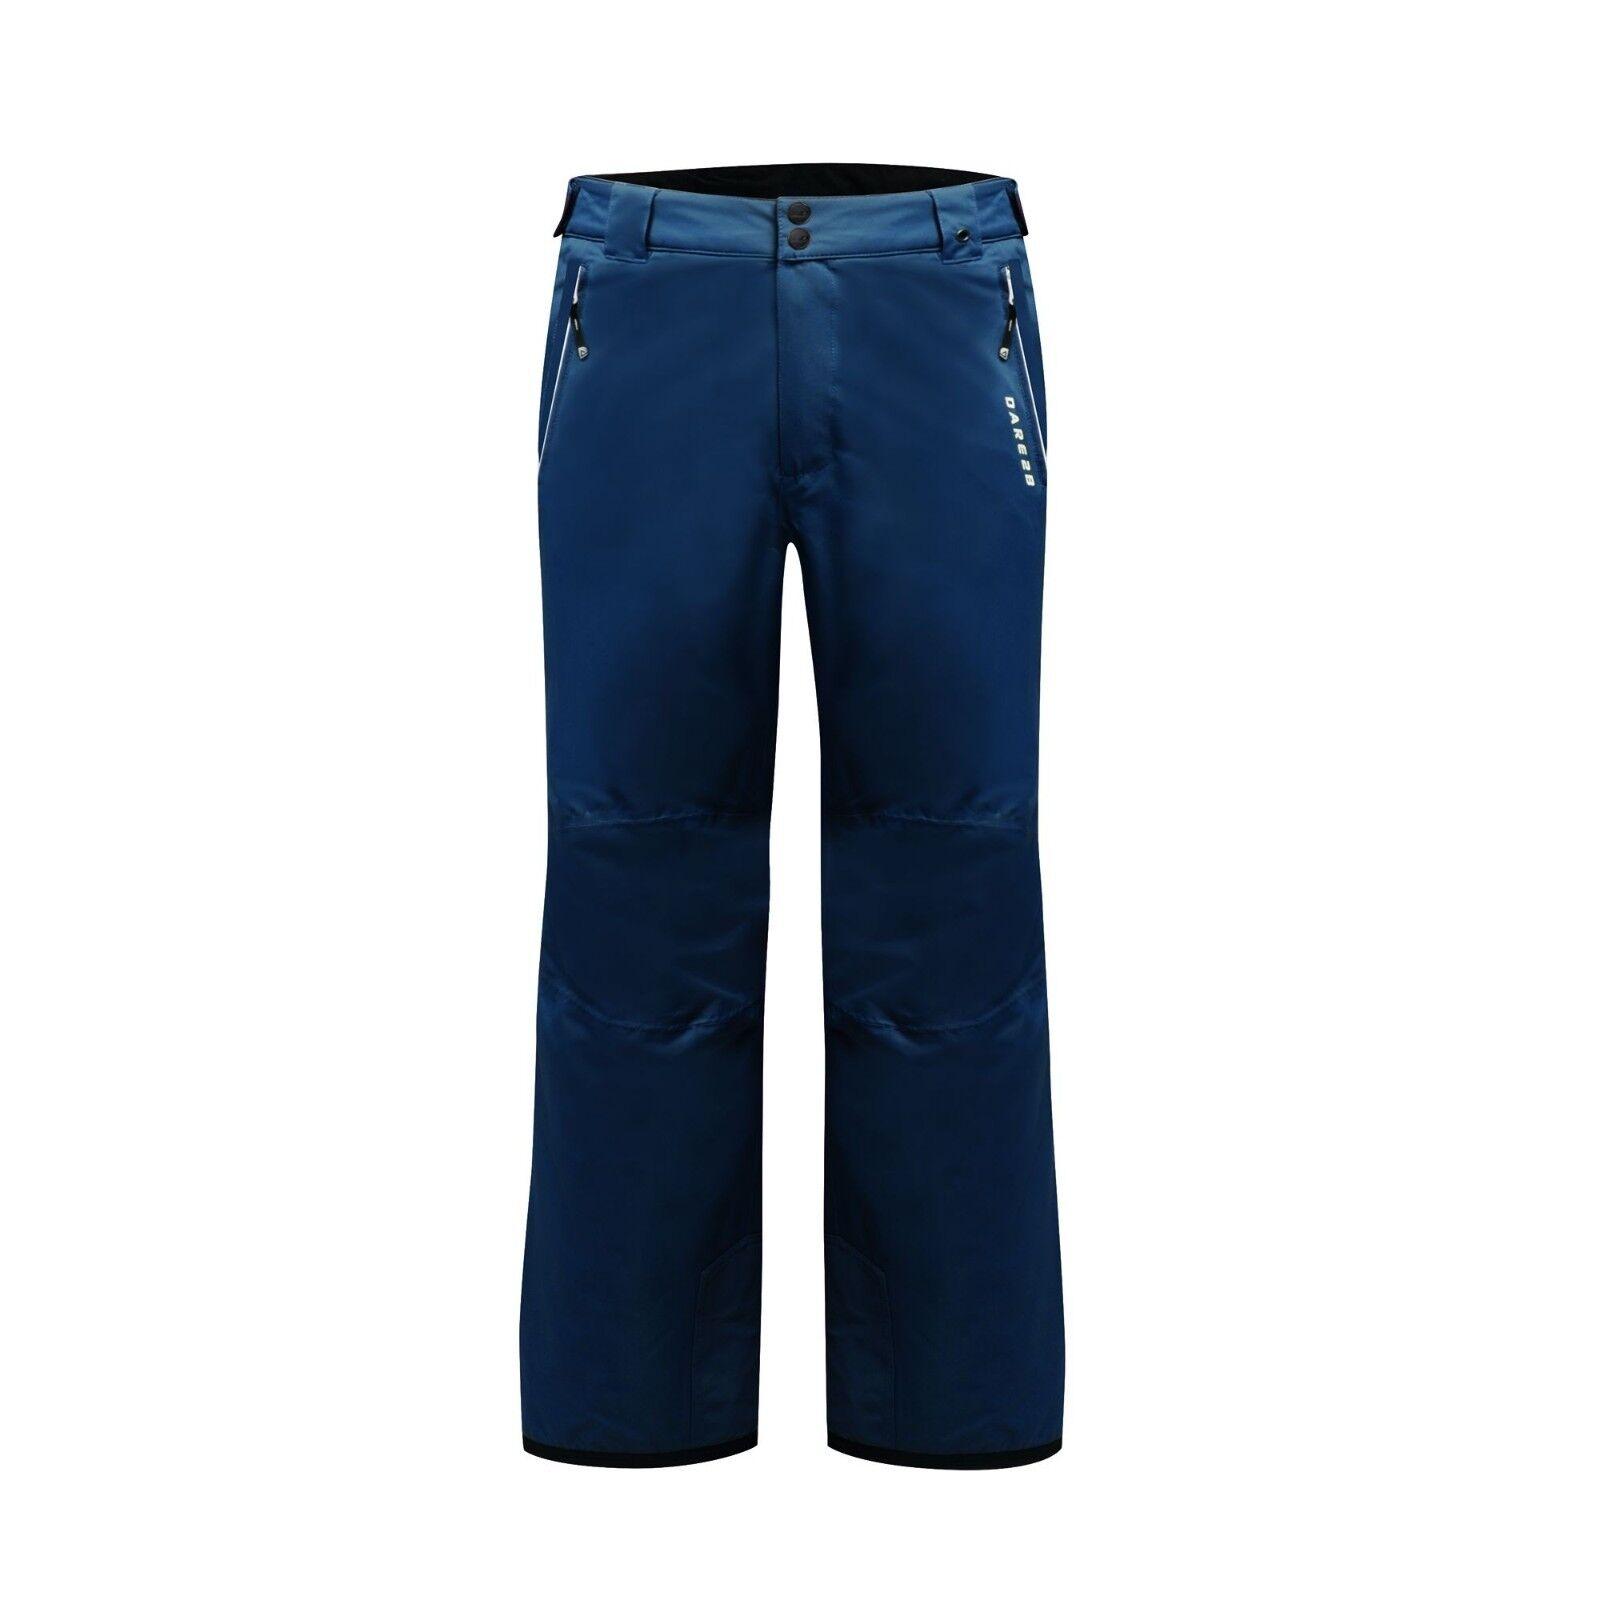 DARE 2B MENS KEEP UP II SKI SALOPETTES PANTS 5000R ADMIRAL Blau SHORT LEG